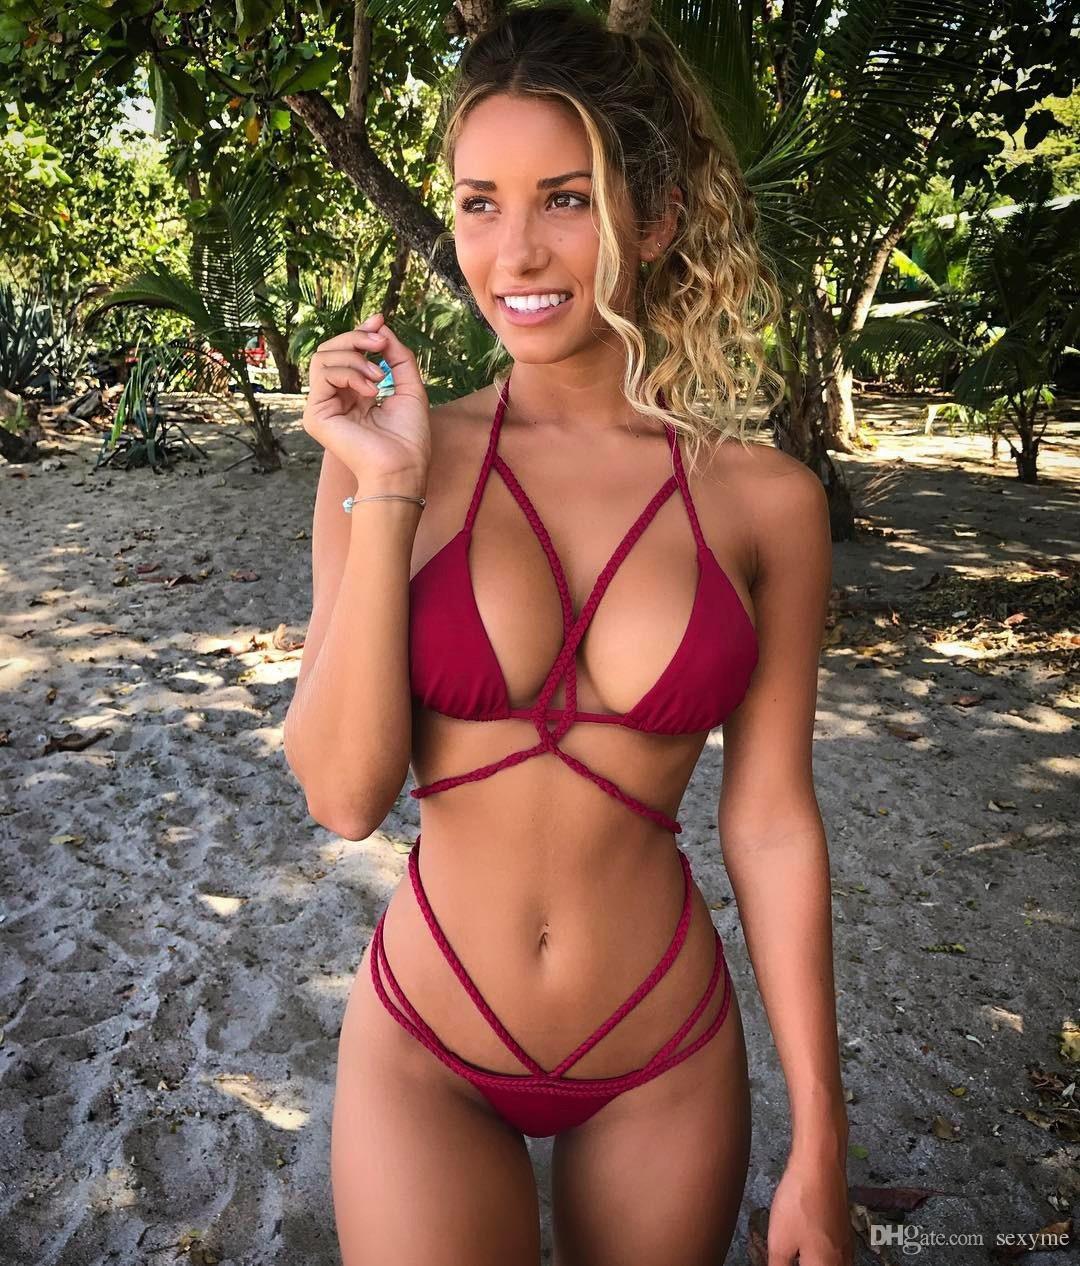 57bdb80137 2019 Women Brazilian Thong Bikini Sets Criss Cross Tied Knot Swimsuits Pad  Bandage Beach Wear Swimwear Female Bathing Suit From Sexyme